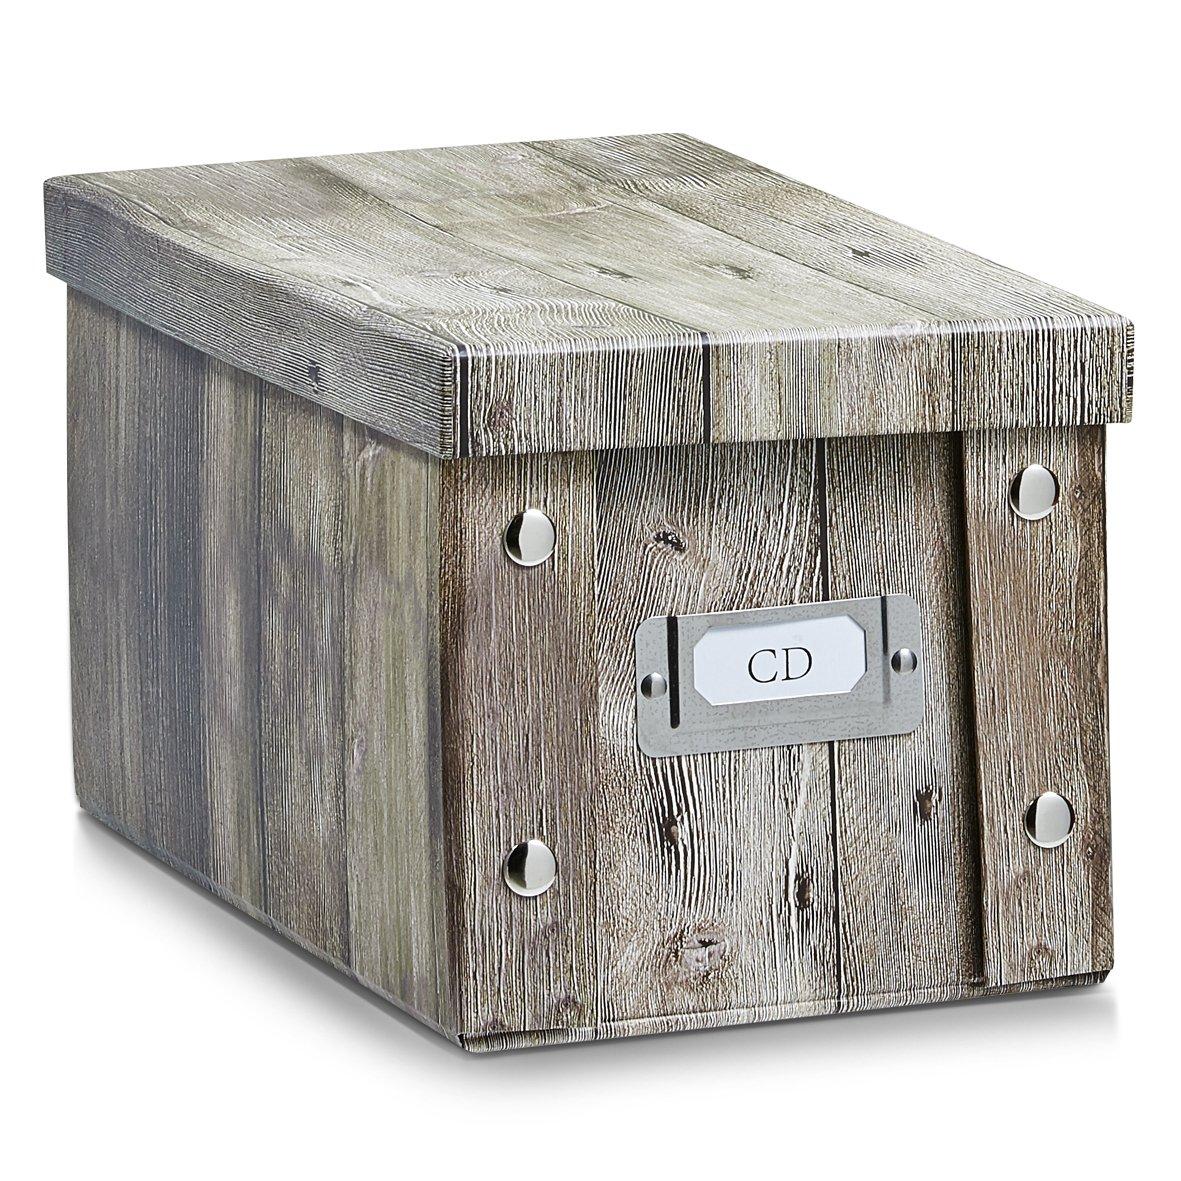 Zeller 17865 Caja de almacenaje de cartón Marrón (Braun) 16.5 x 28 x 15 cm: Amazon.es: Hogar